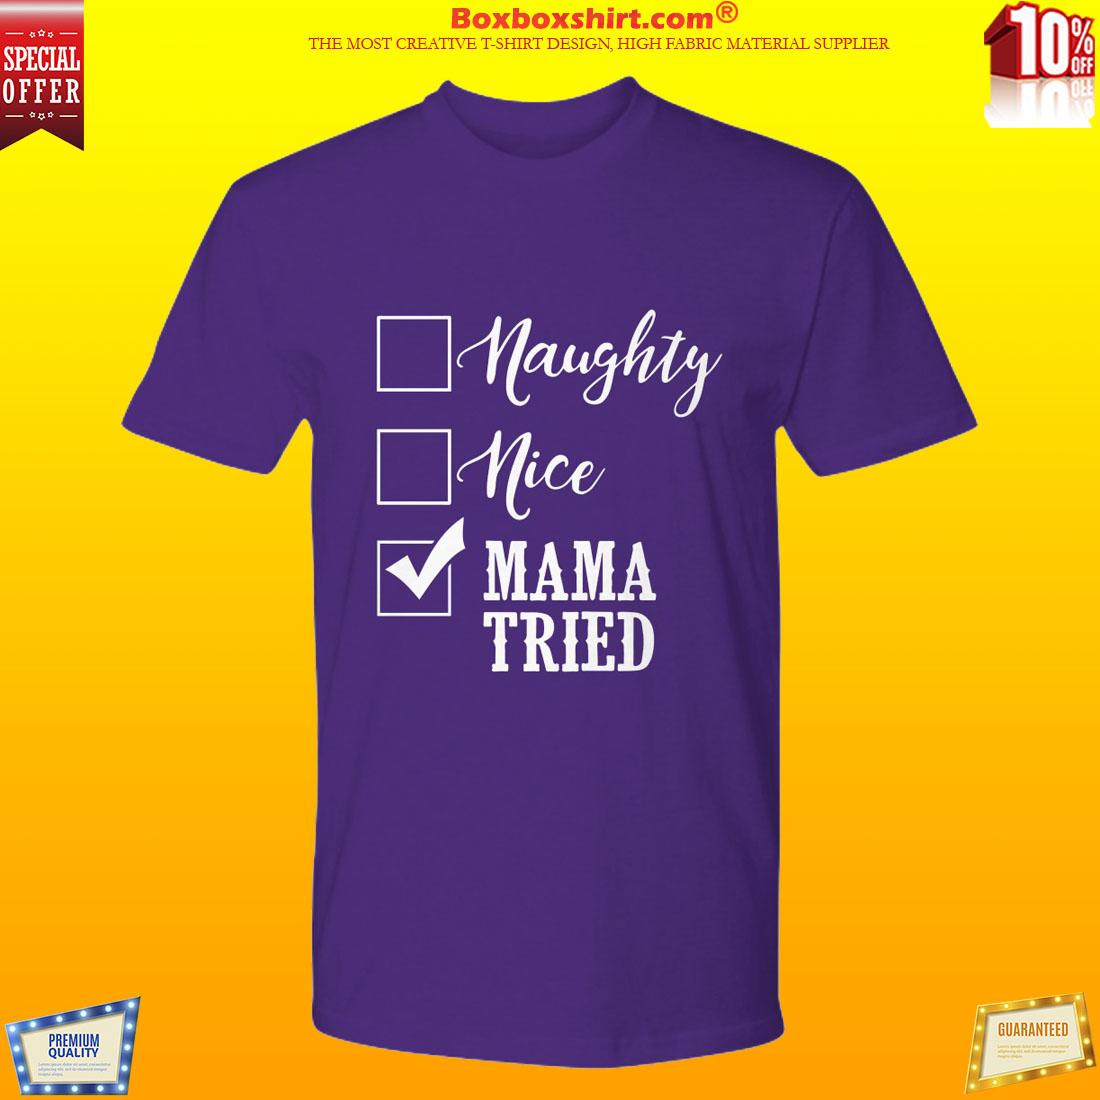 Naughty nice burned mama tried shirt